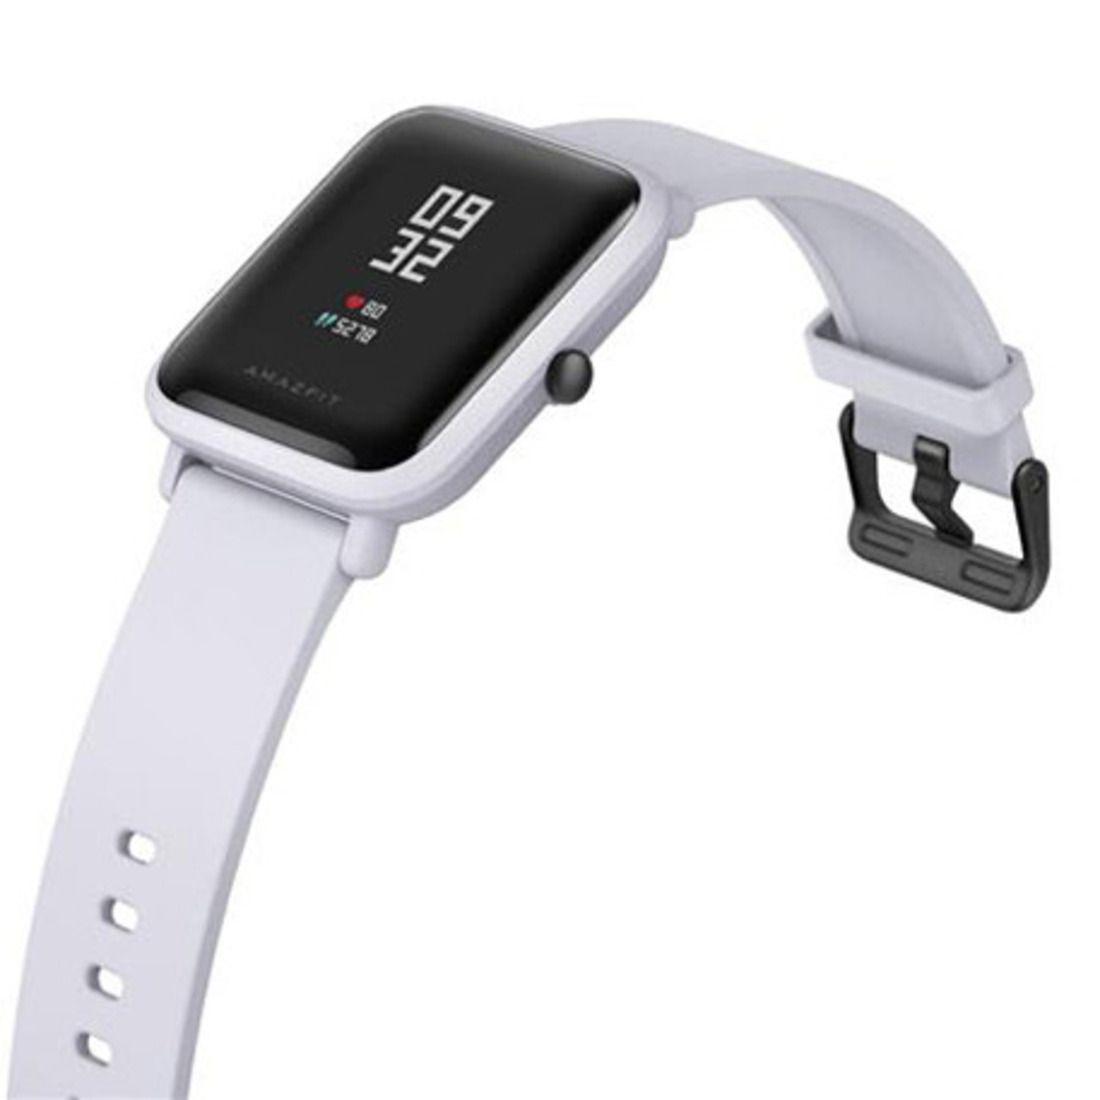 Smartwatch Relogio Amazfit Bip - Branco  - PAGDEPOIS